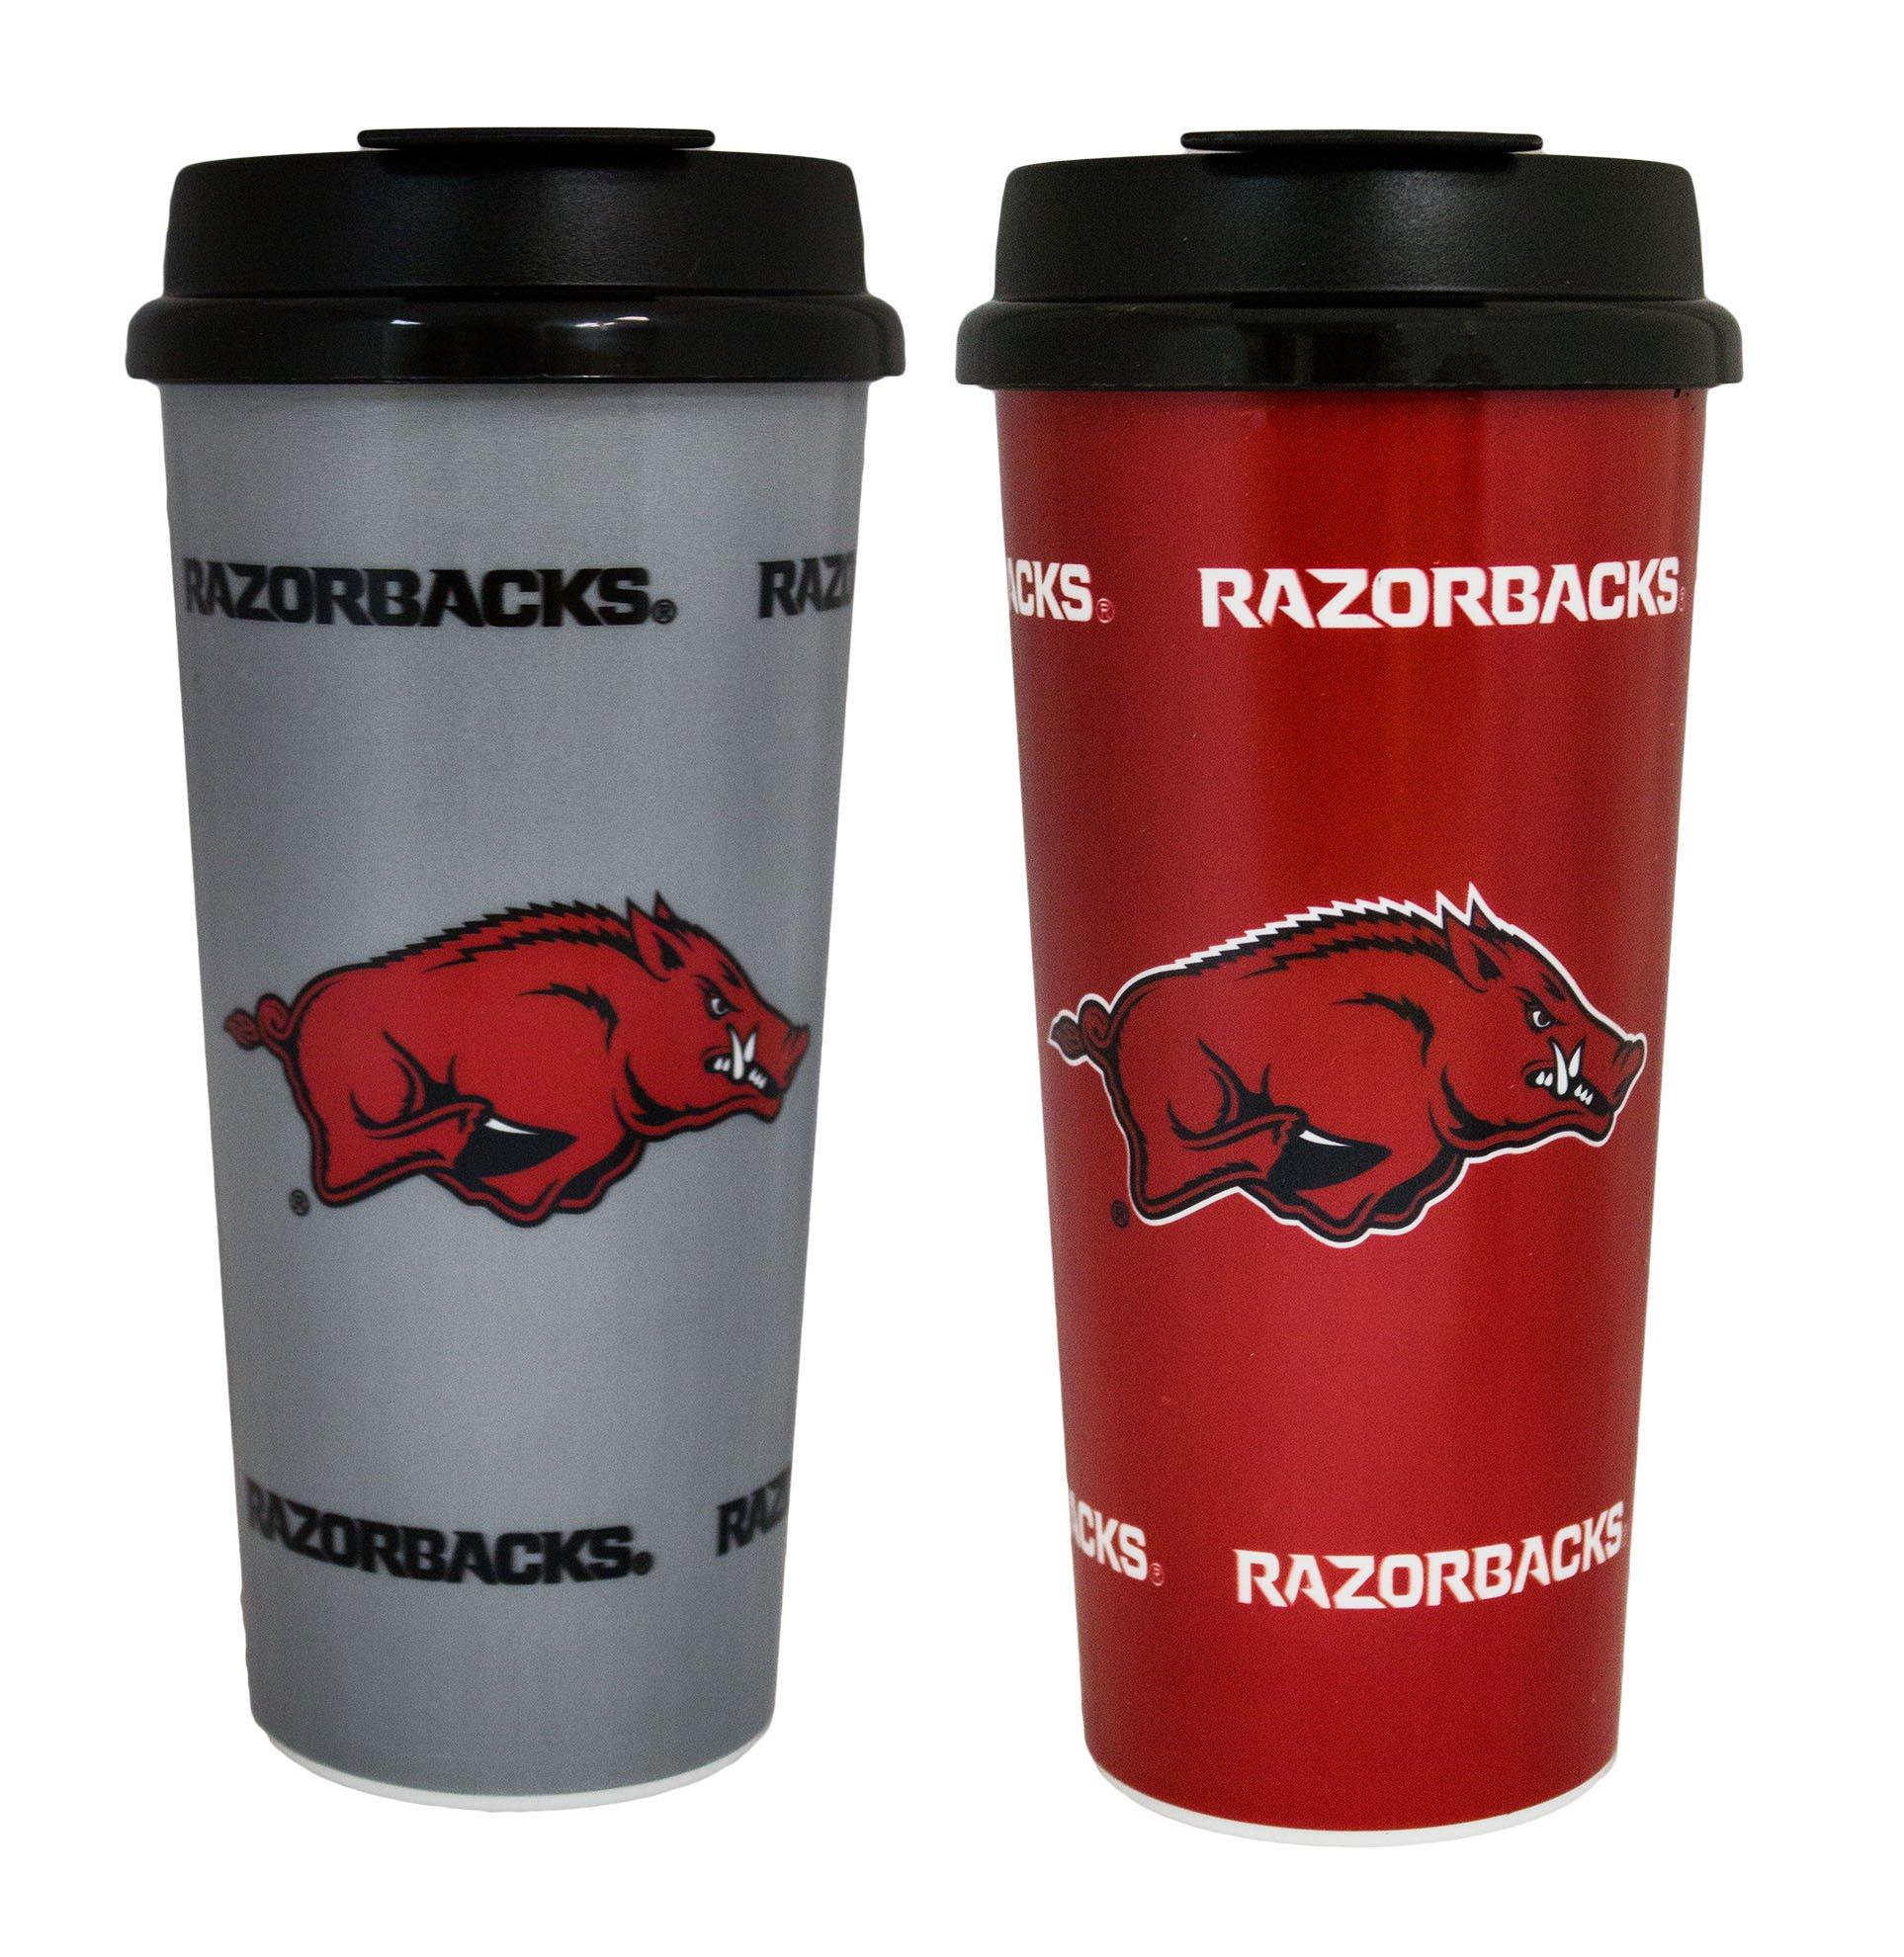 GameDay Novelty NCAA Arkansas Razorbacks Insulated Travel Tumbler, 16 oz